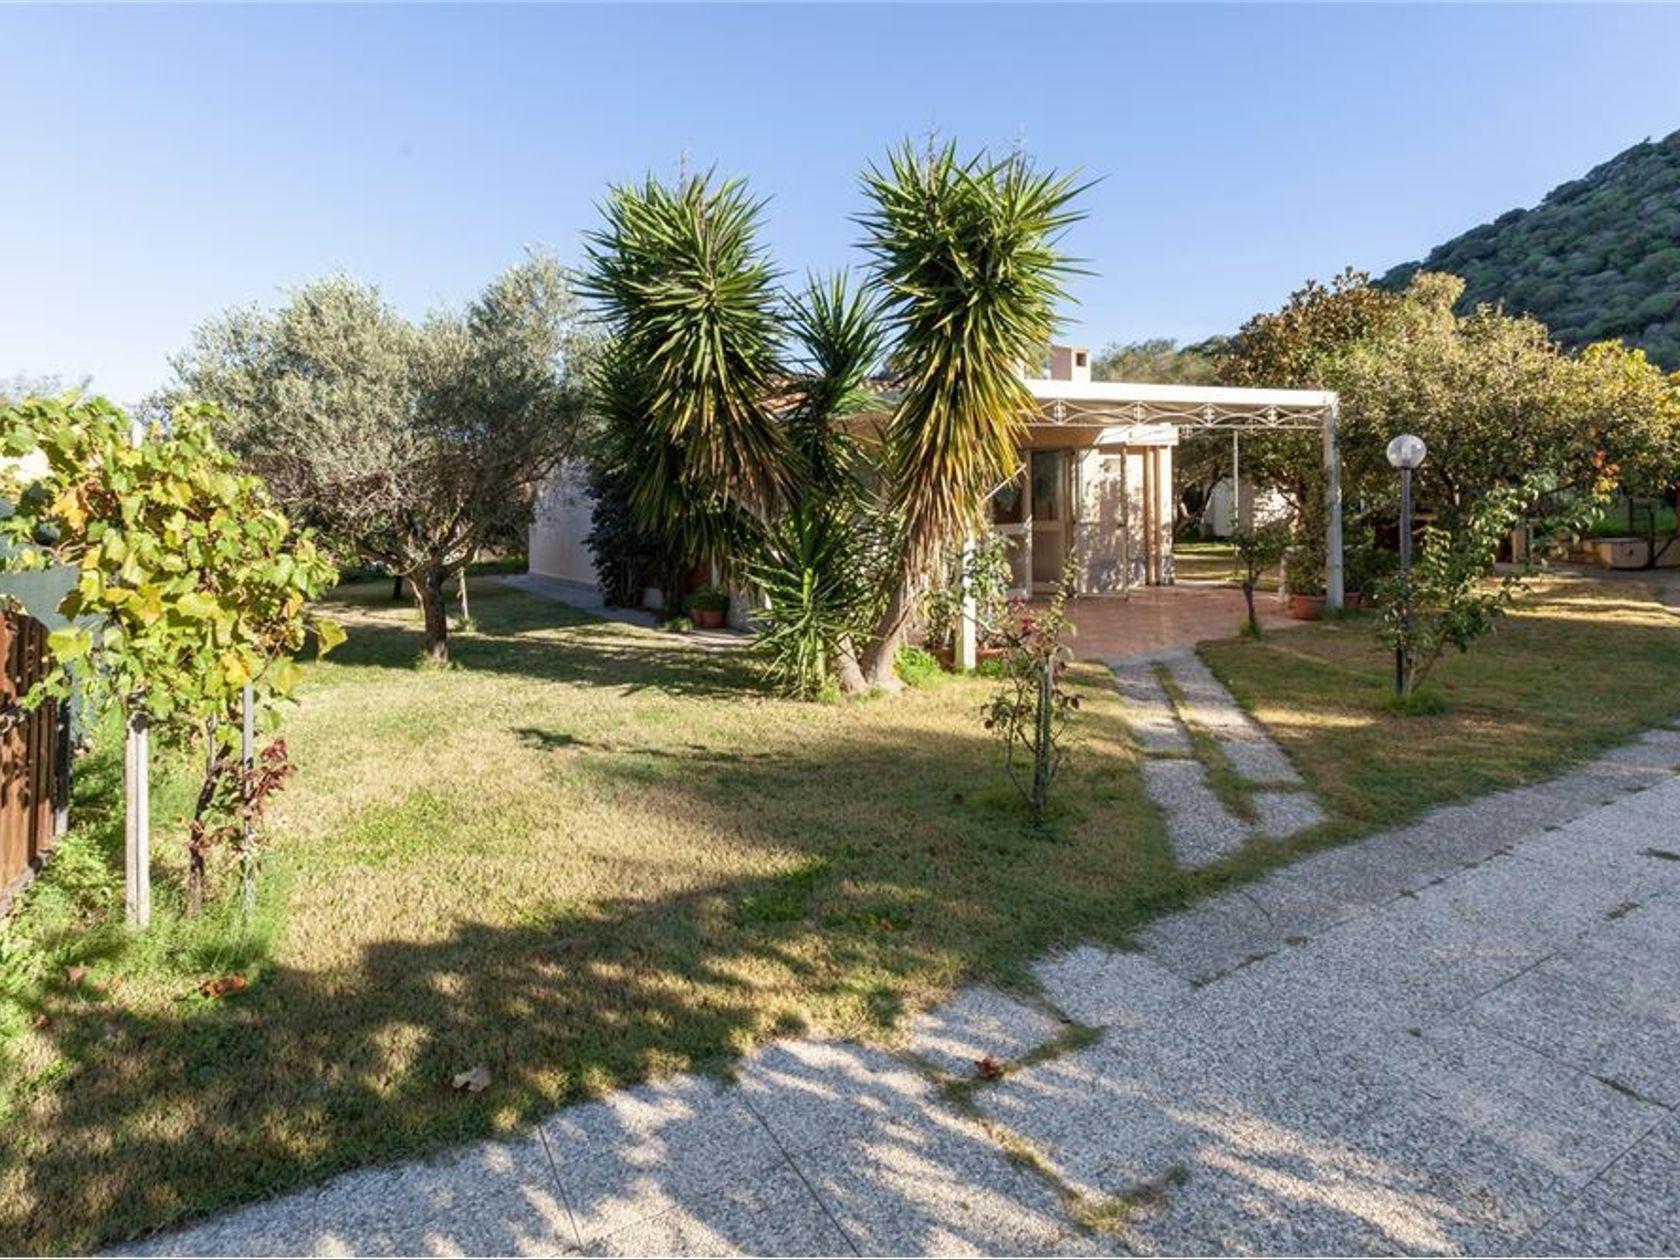 Villa singola Geremeas, Maracalagonis, CA Vendita - Foto 5